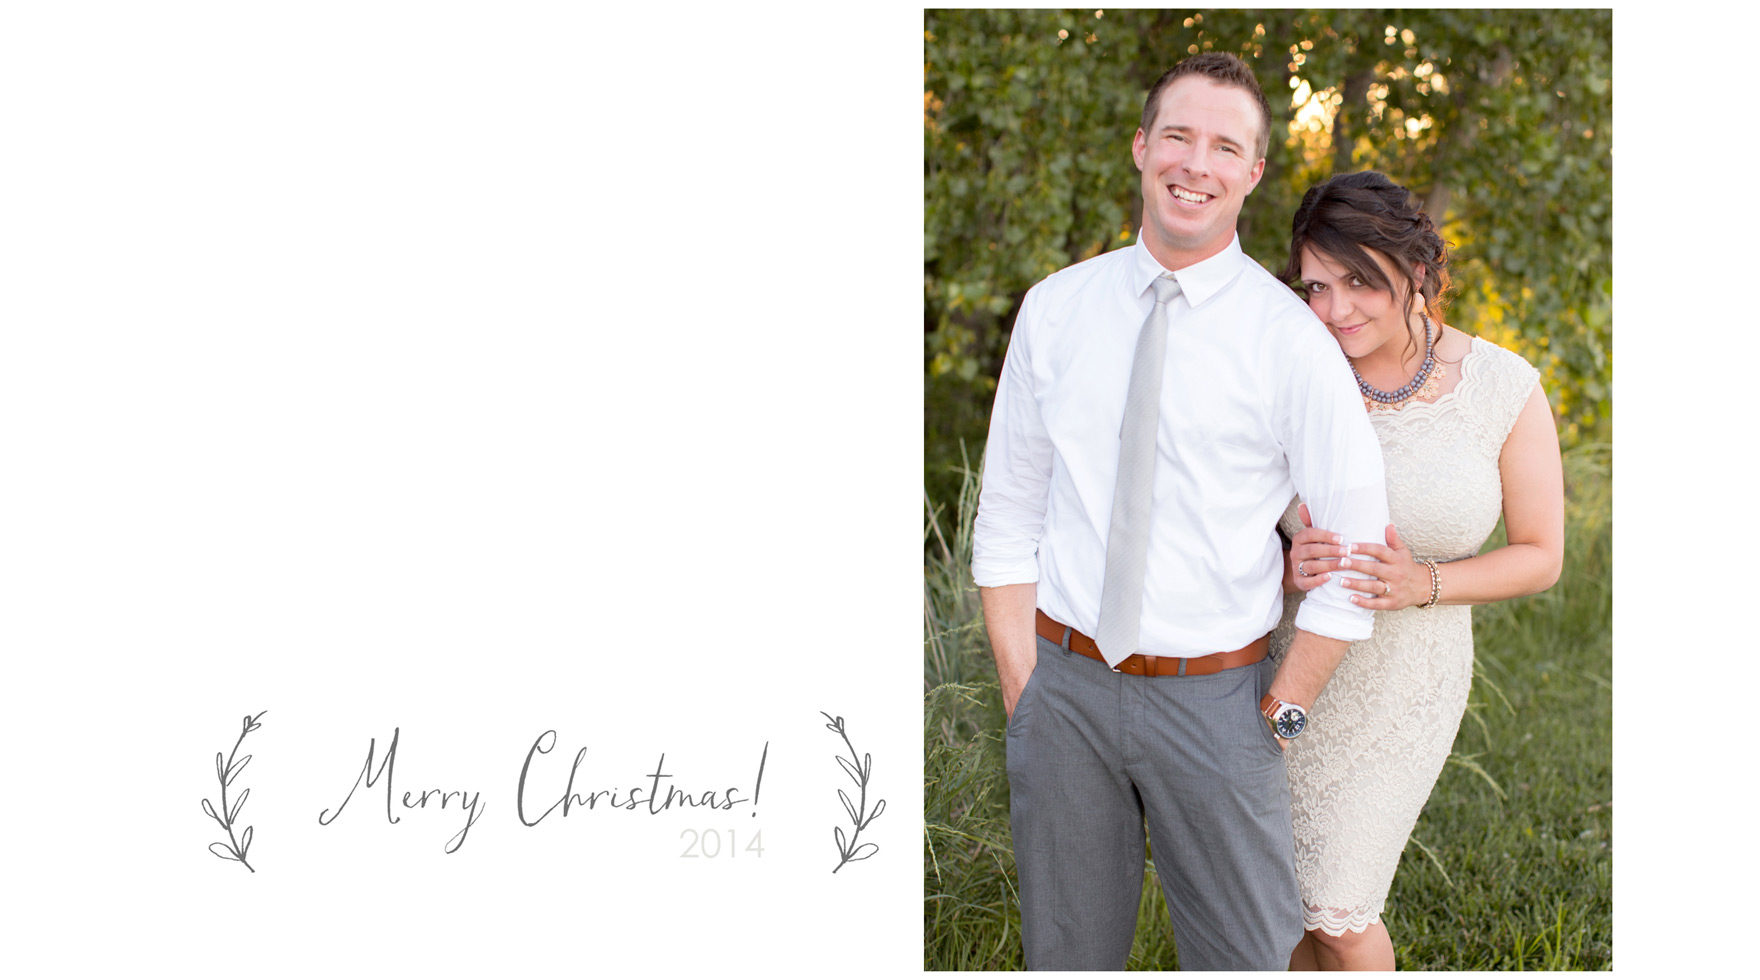 kel and mel, merry christmas, nebraska marriage photographers